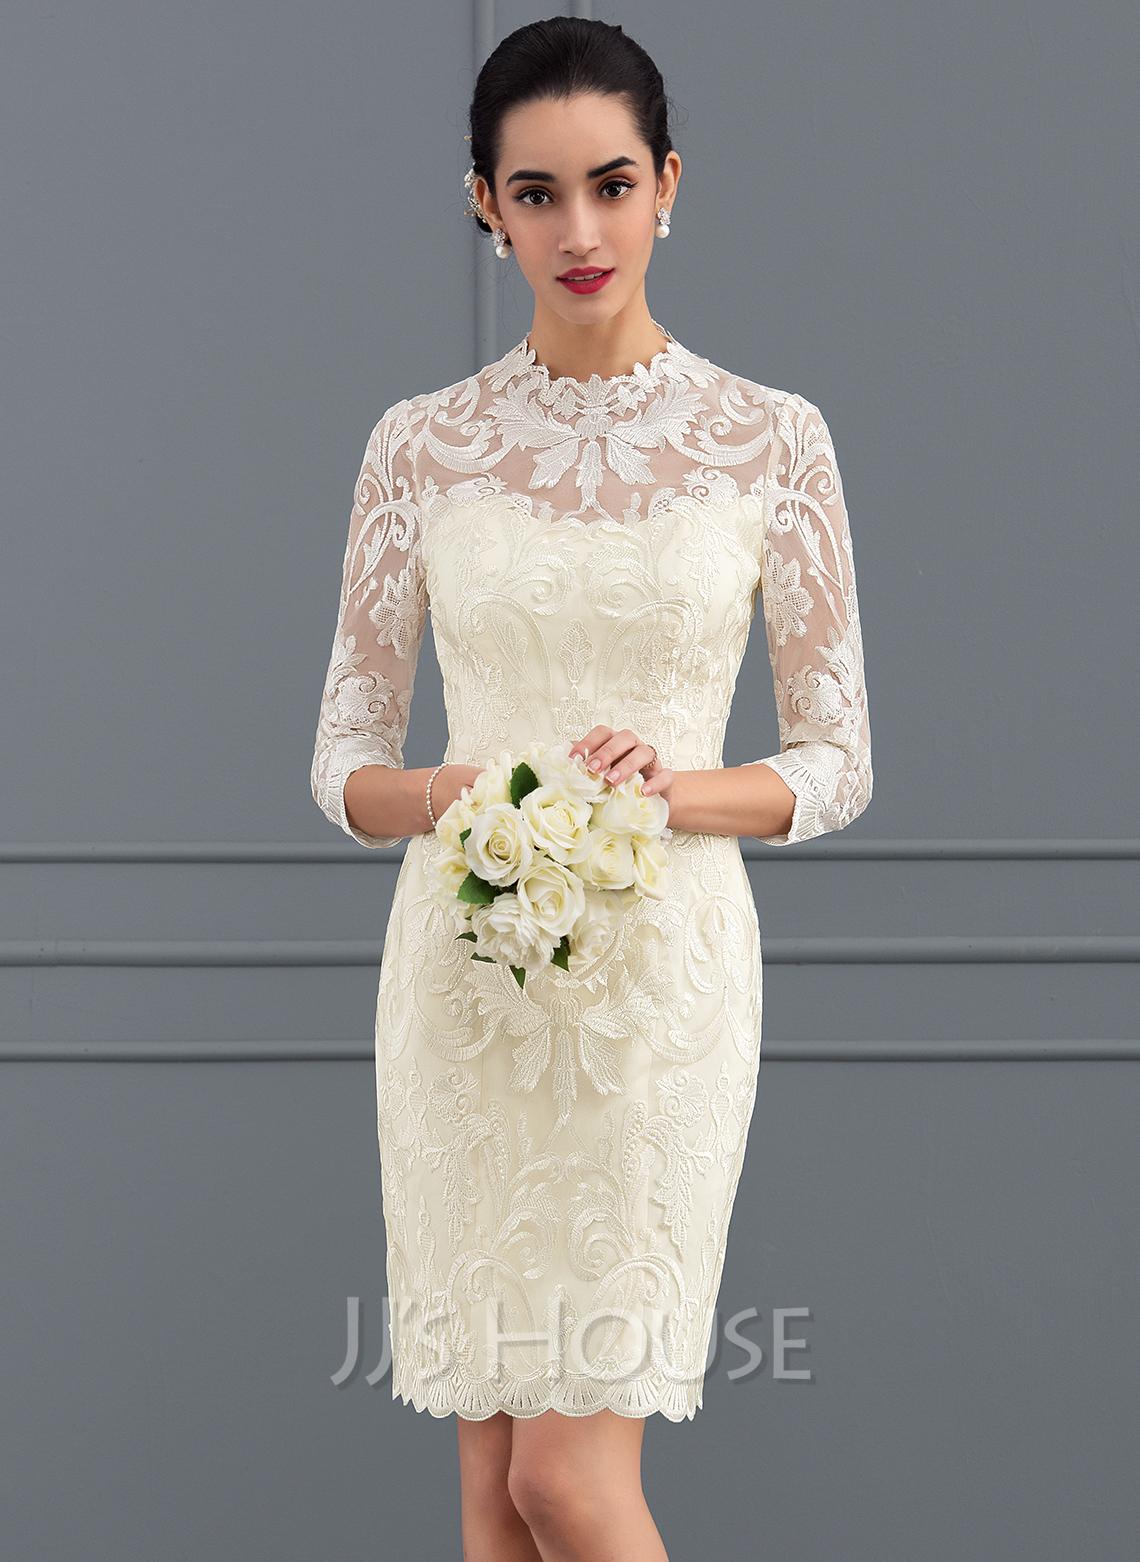 Sheath/Column High Neck Knee-Length Lace Wedding Dress